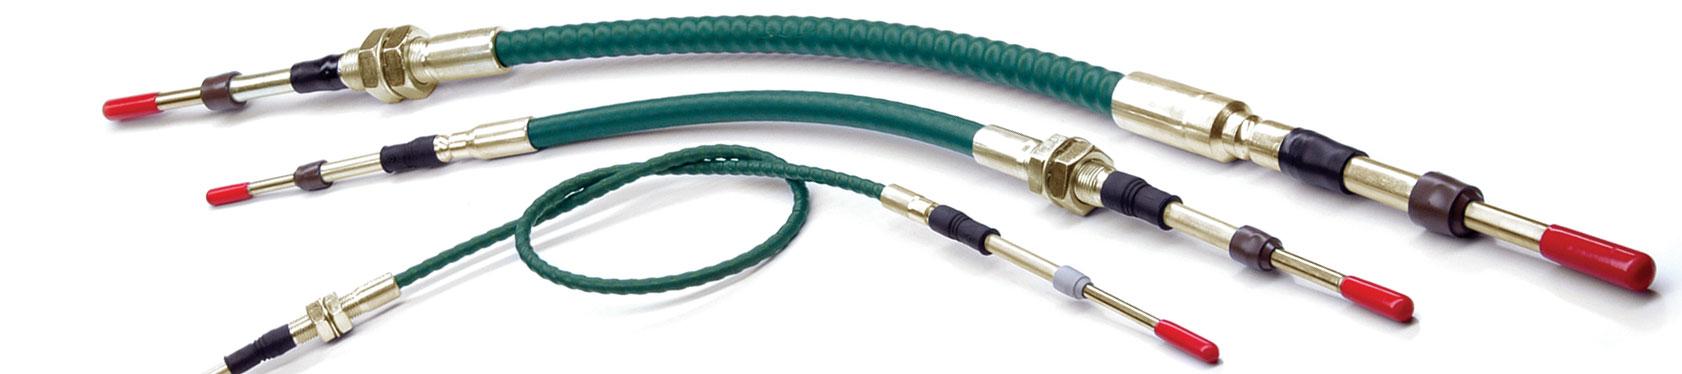 Cablecraft Control Cables